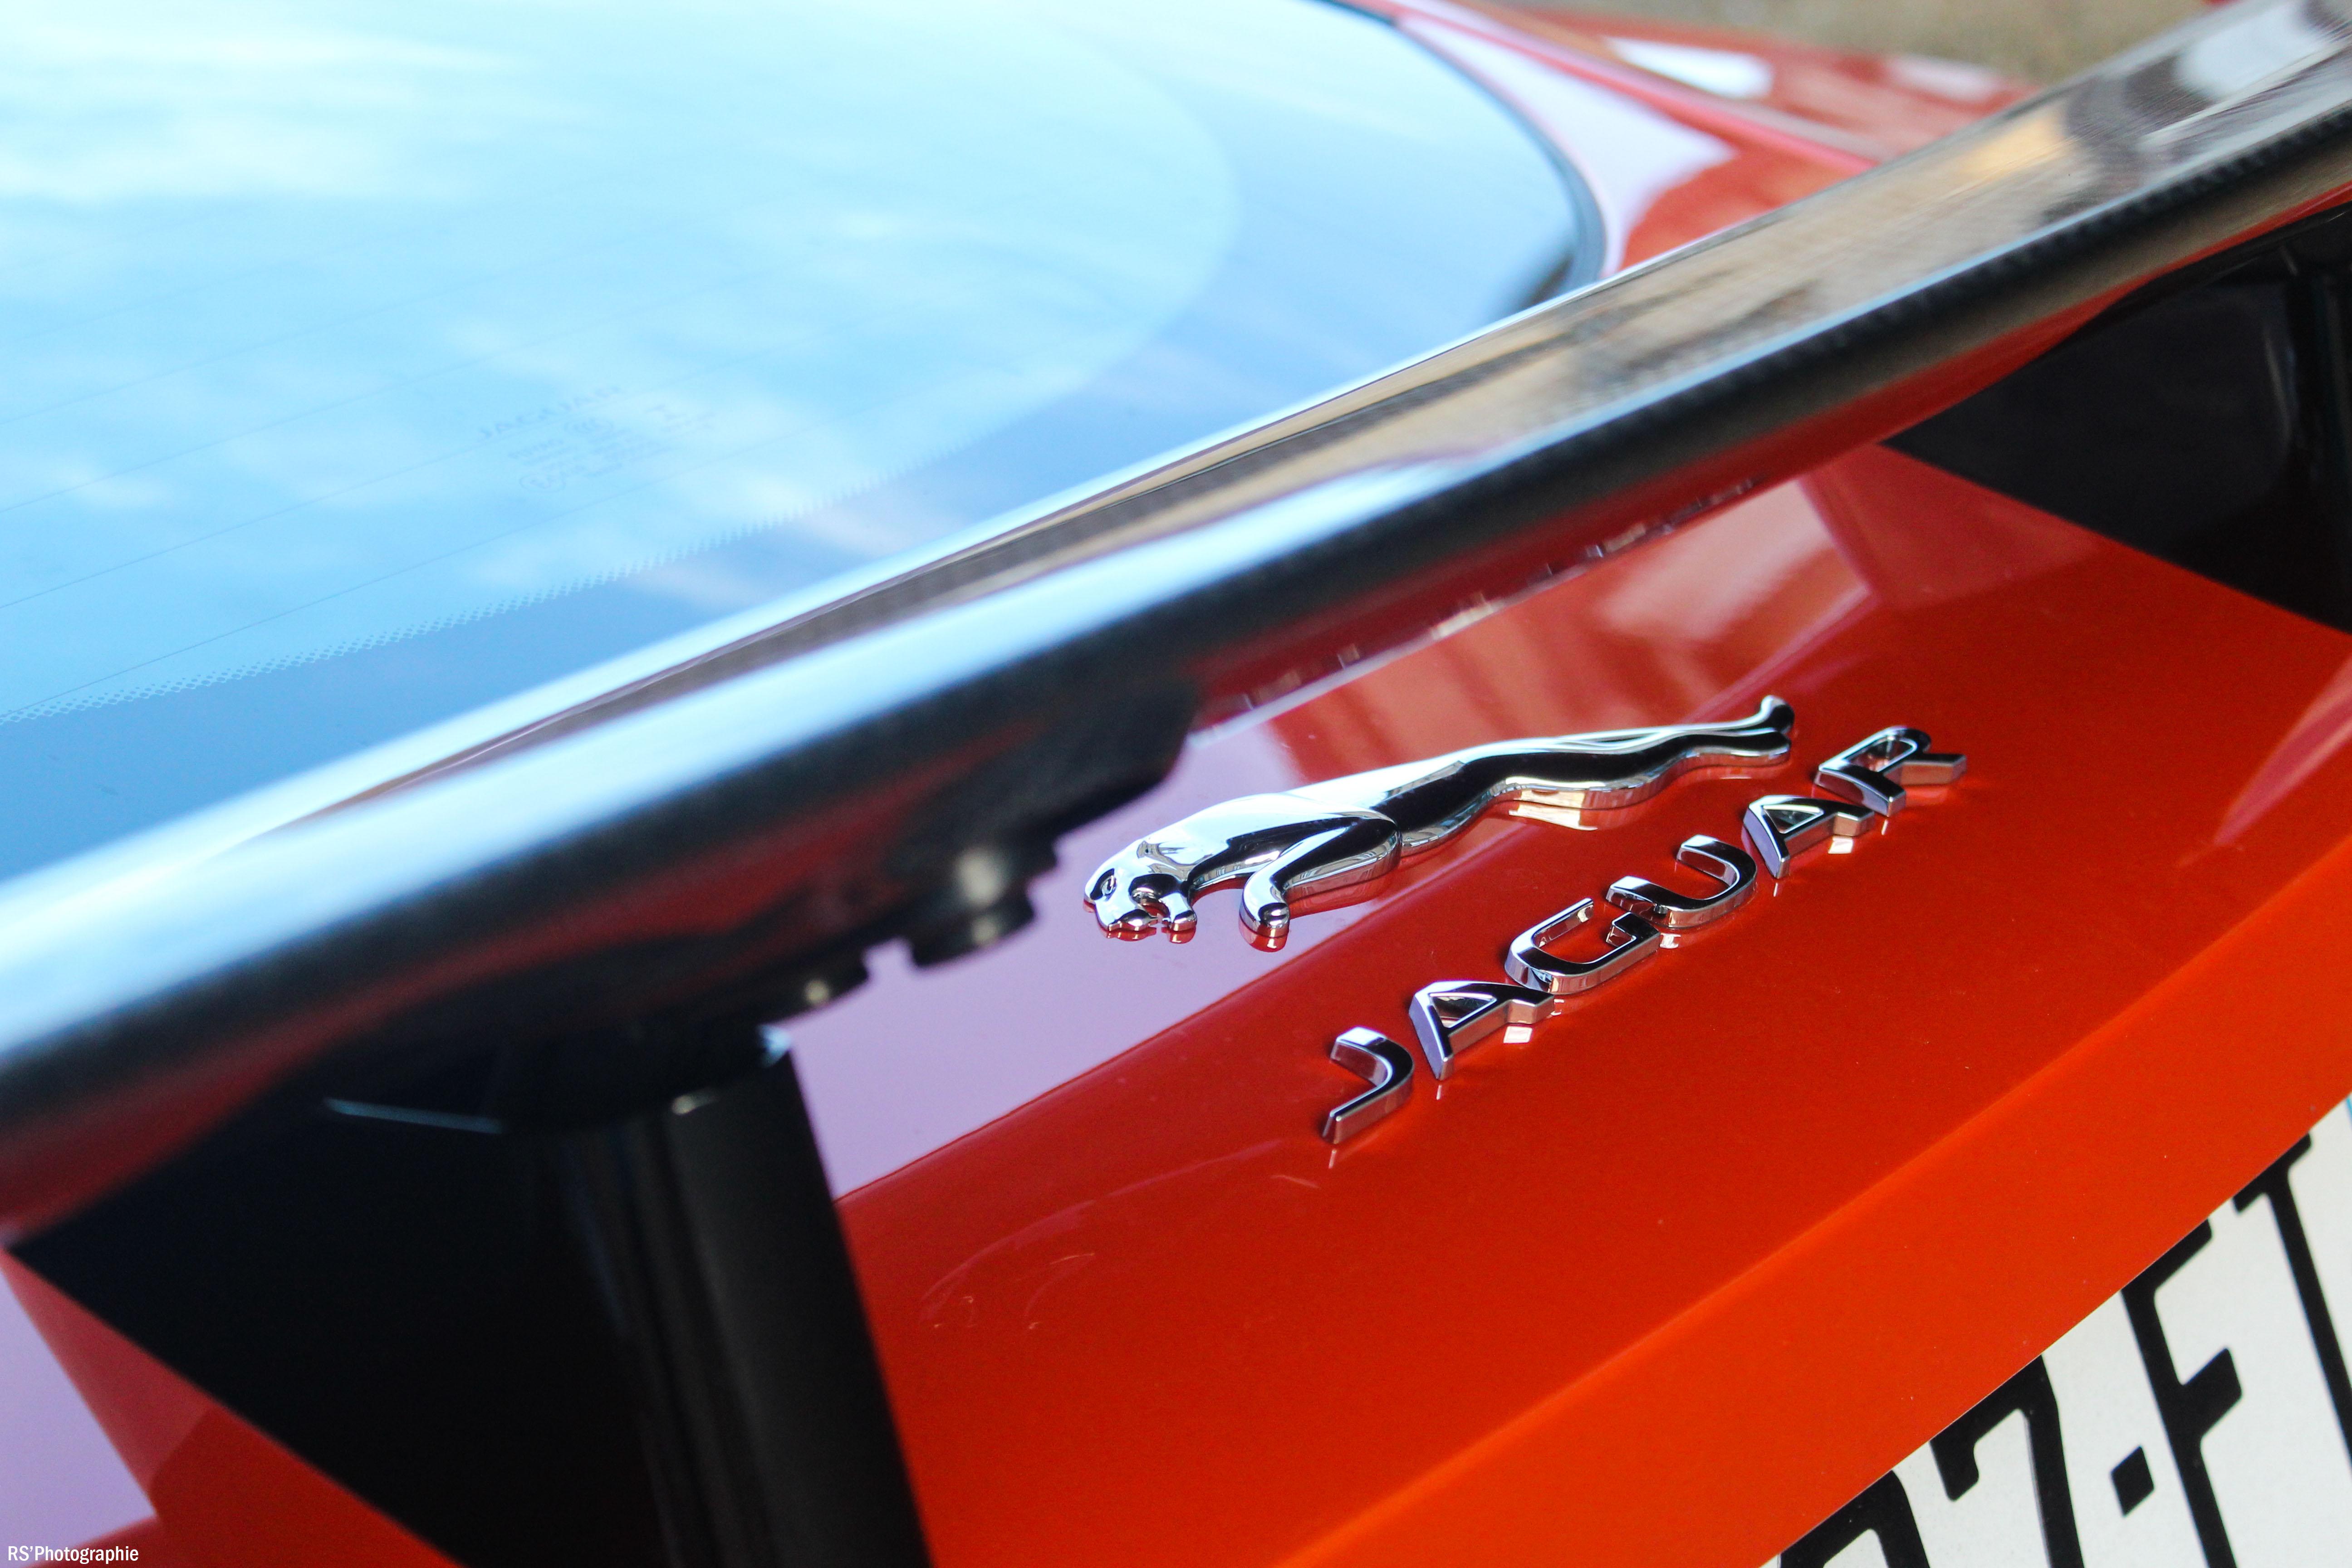 jaguarftypesvr24-jaguar-ftype-svr-aileron-spoiler-arnaud-demasier-rsphotographie